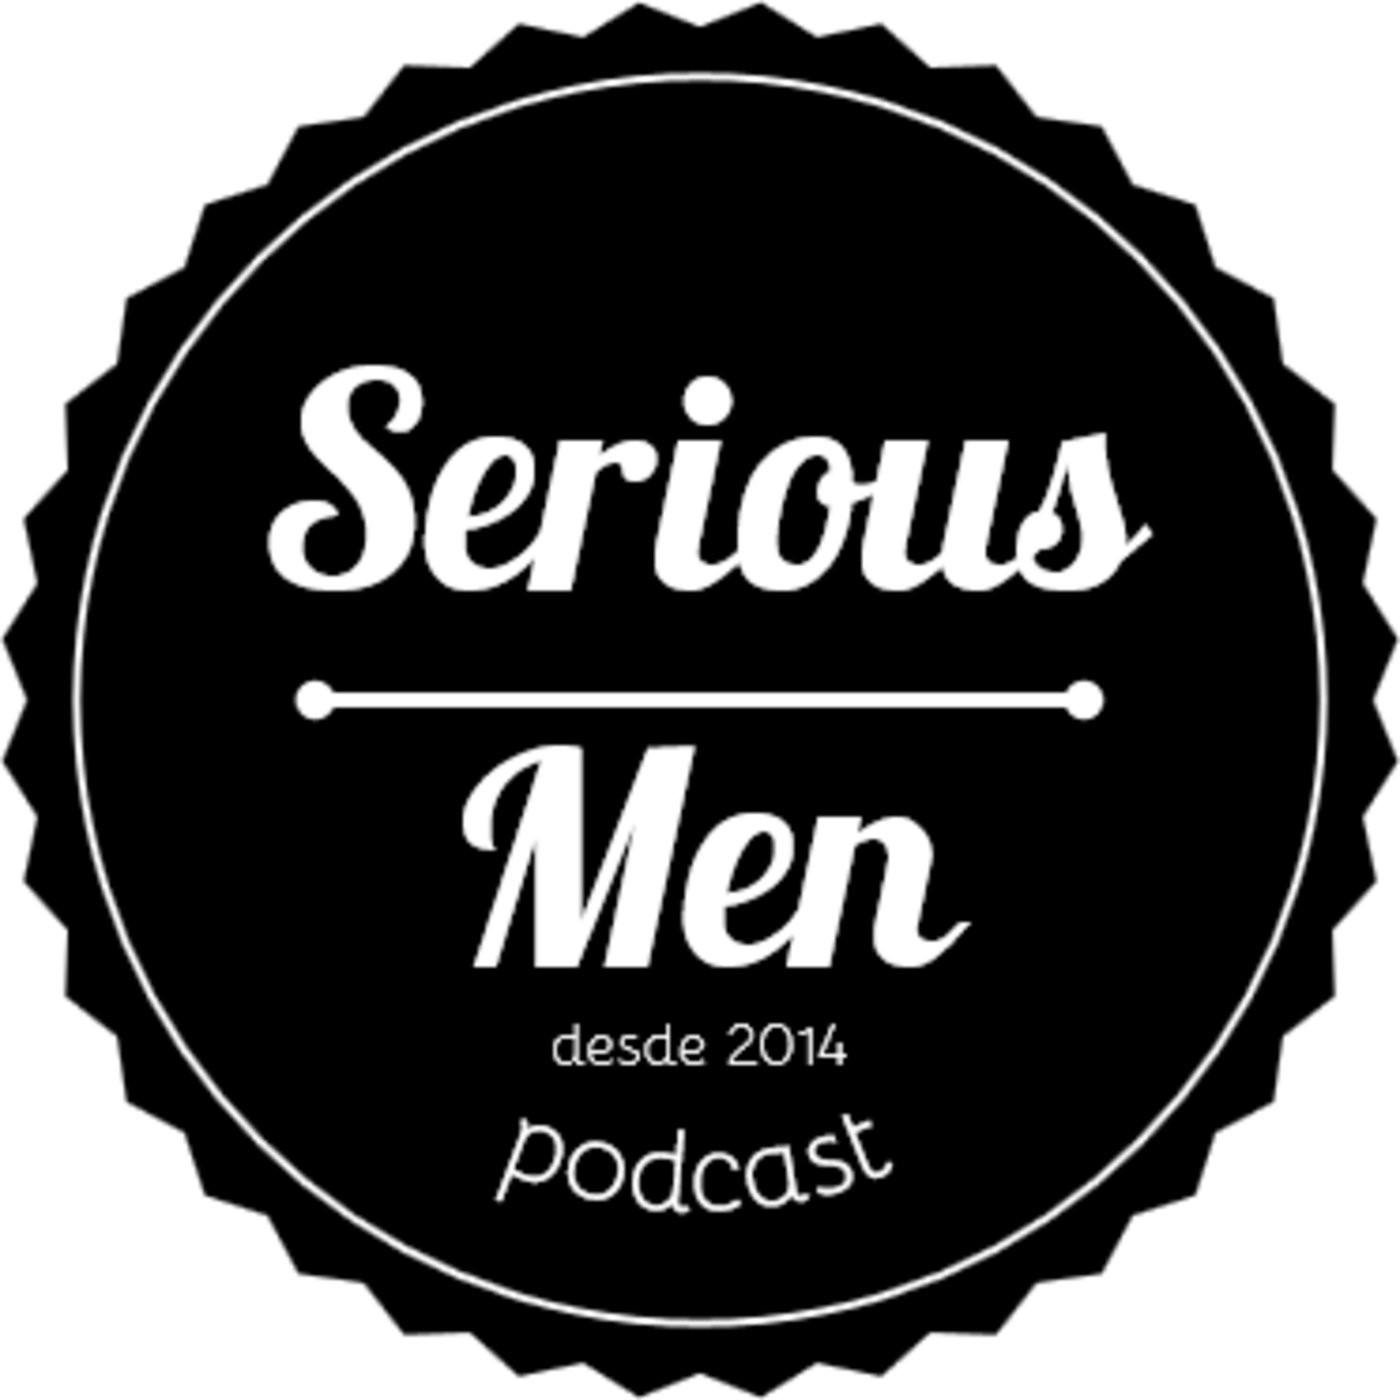 <![CDATA[Serious Men]]>